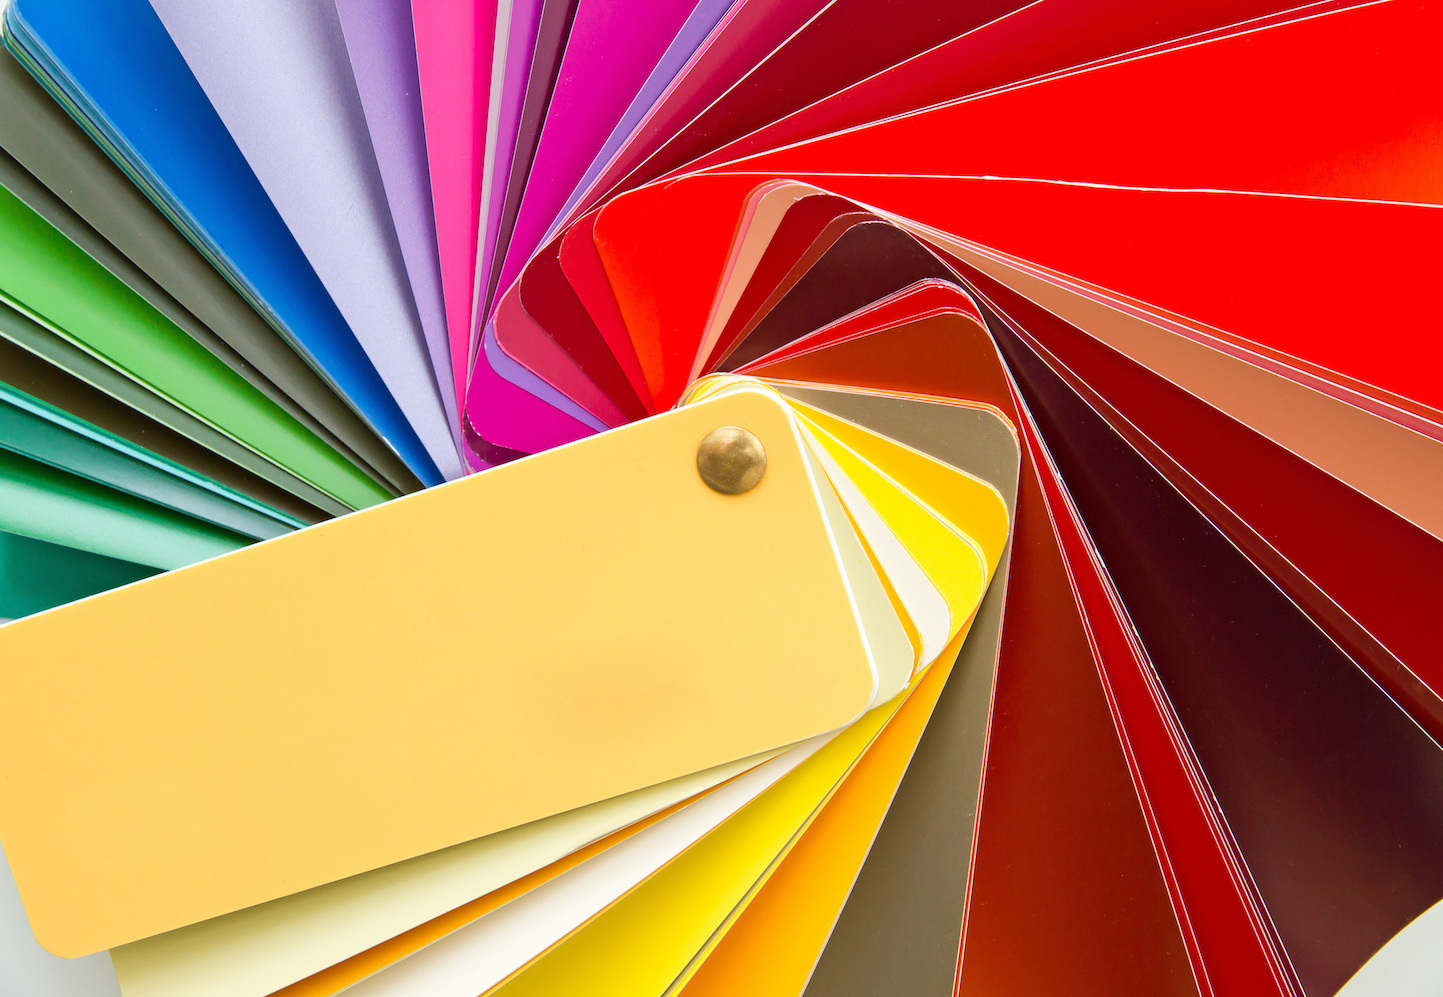 TG-couleurs-bandeau.jpeg